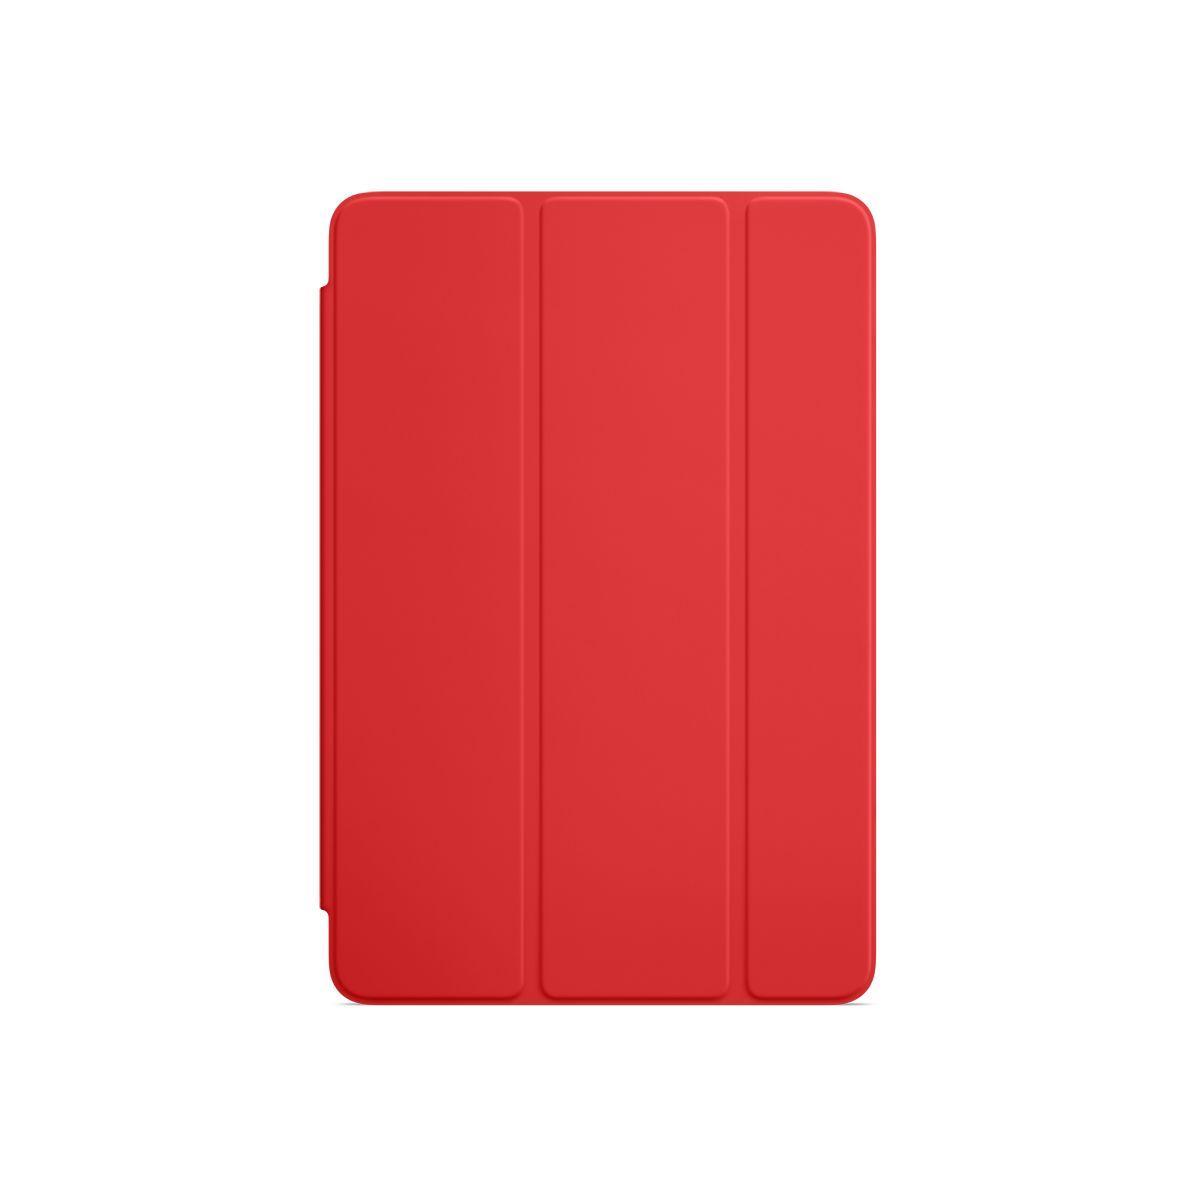 Housse apple silicone rouge ipad mini 4 (photo)